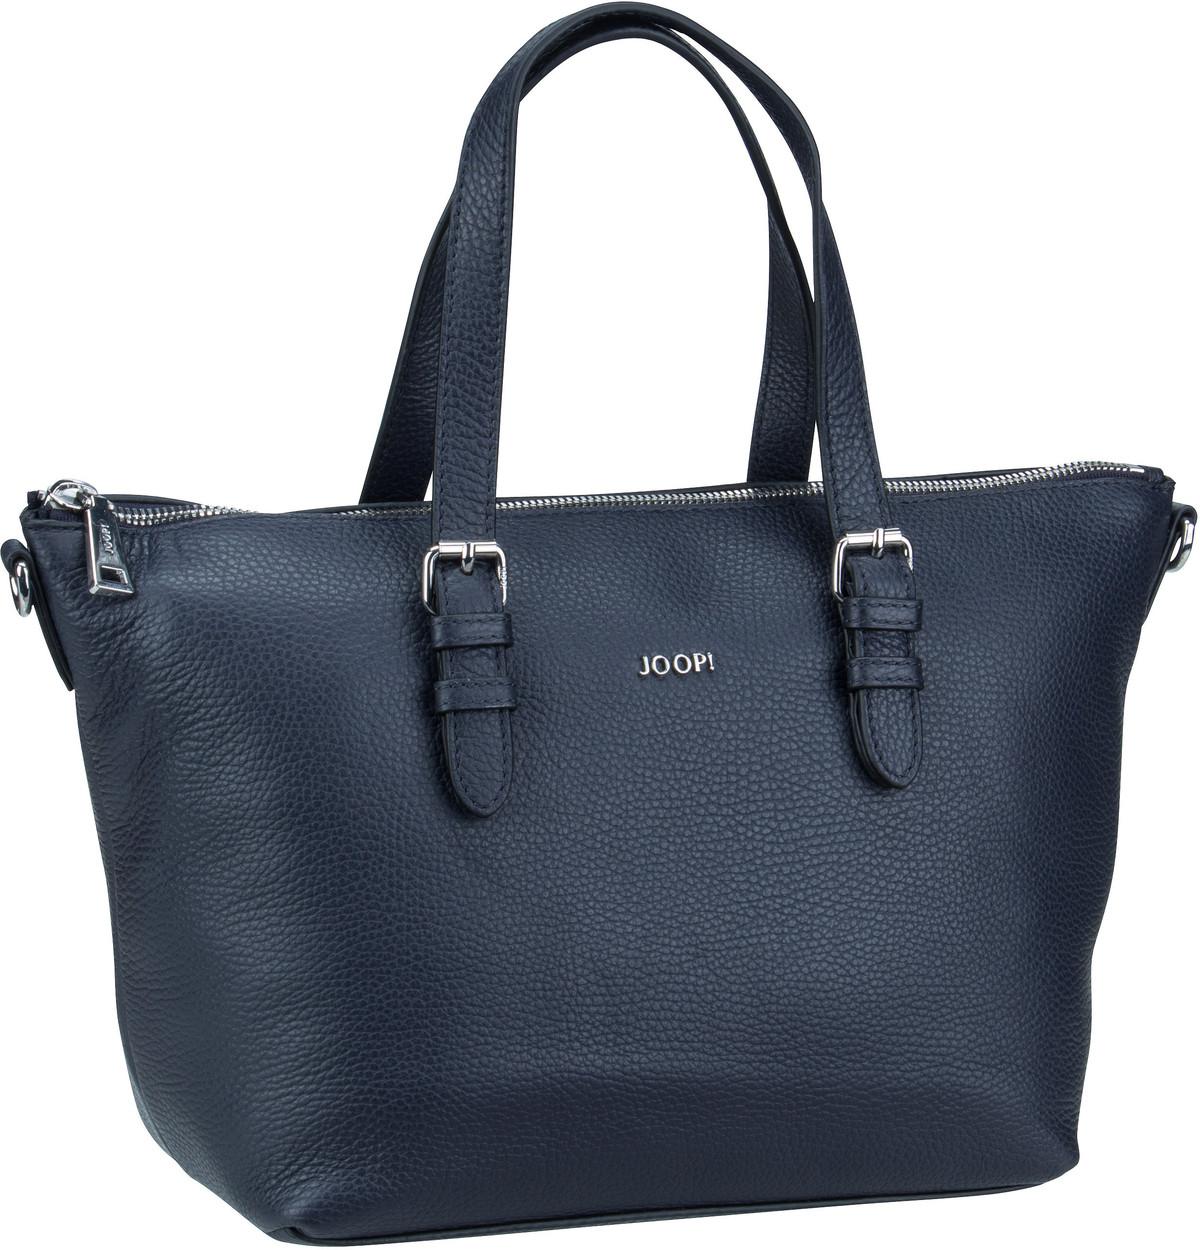 Handtasche Chiara Marla HandBag MHZ Dark Blue